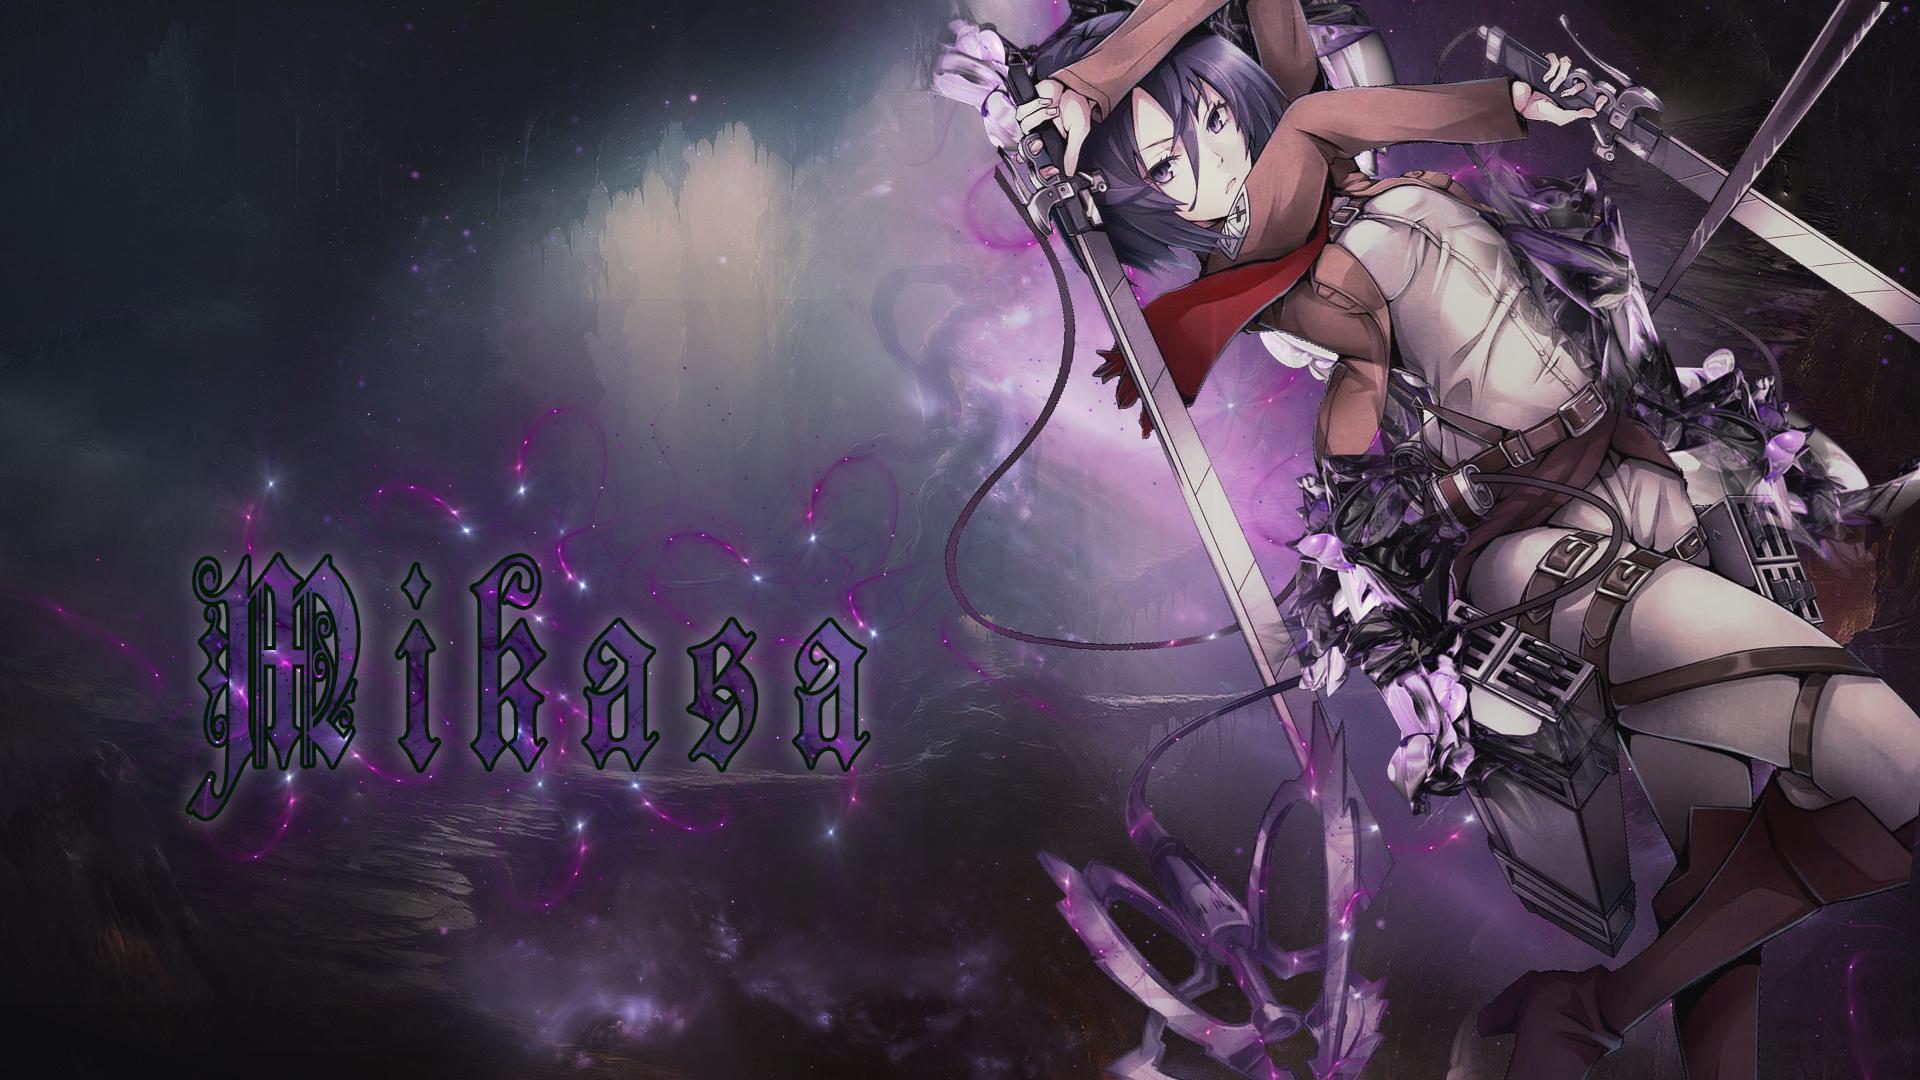 Mikasa Attack On Titan Wallpaper By Ganger Design